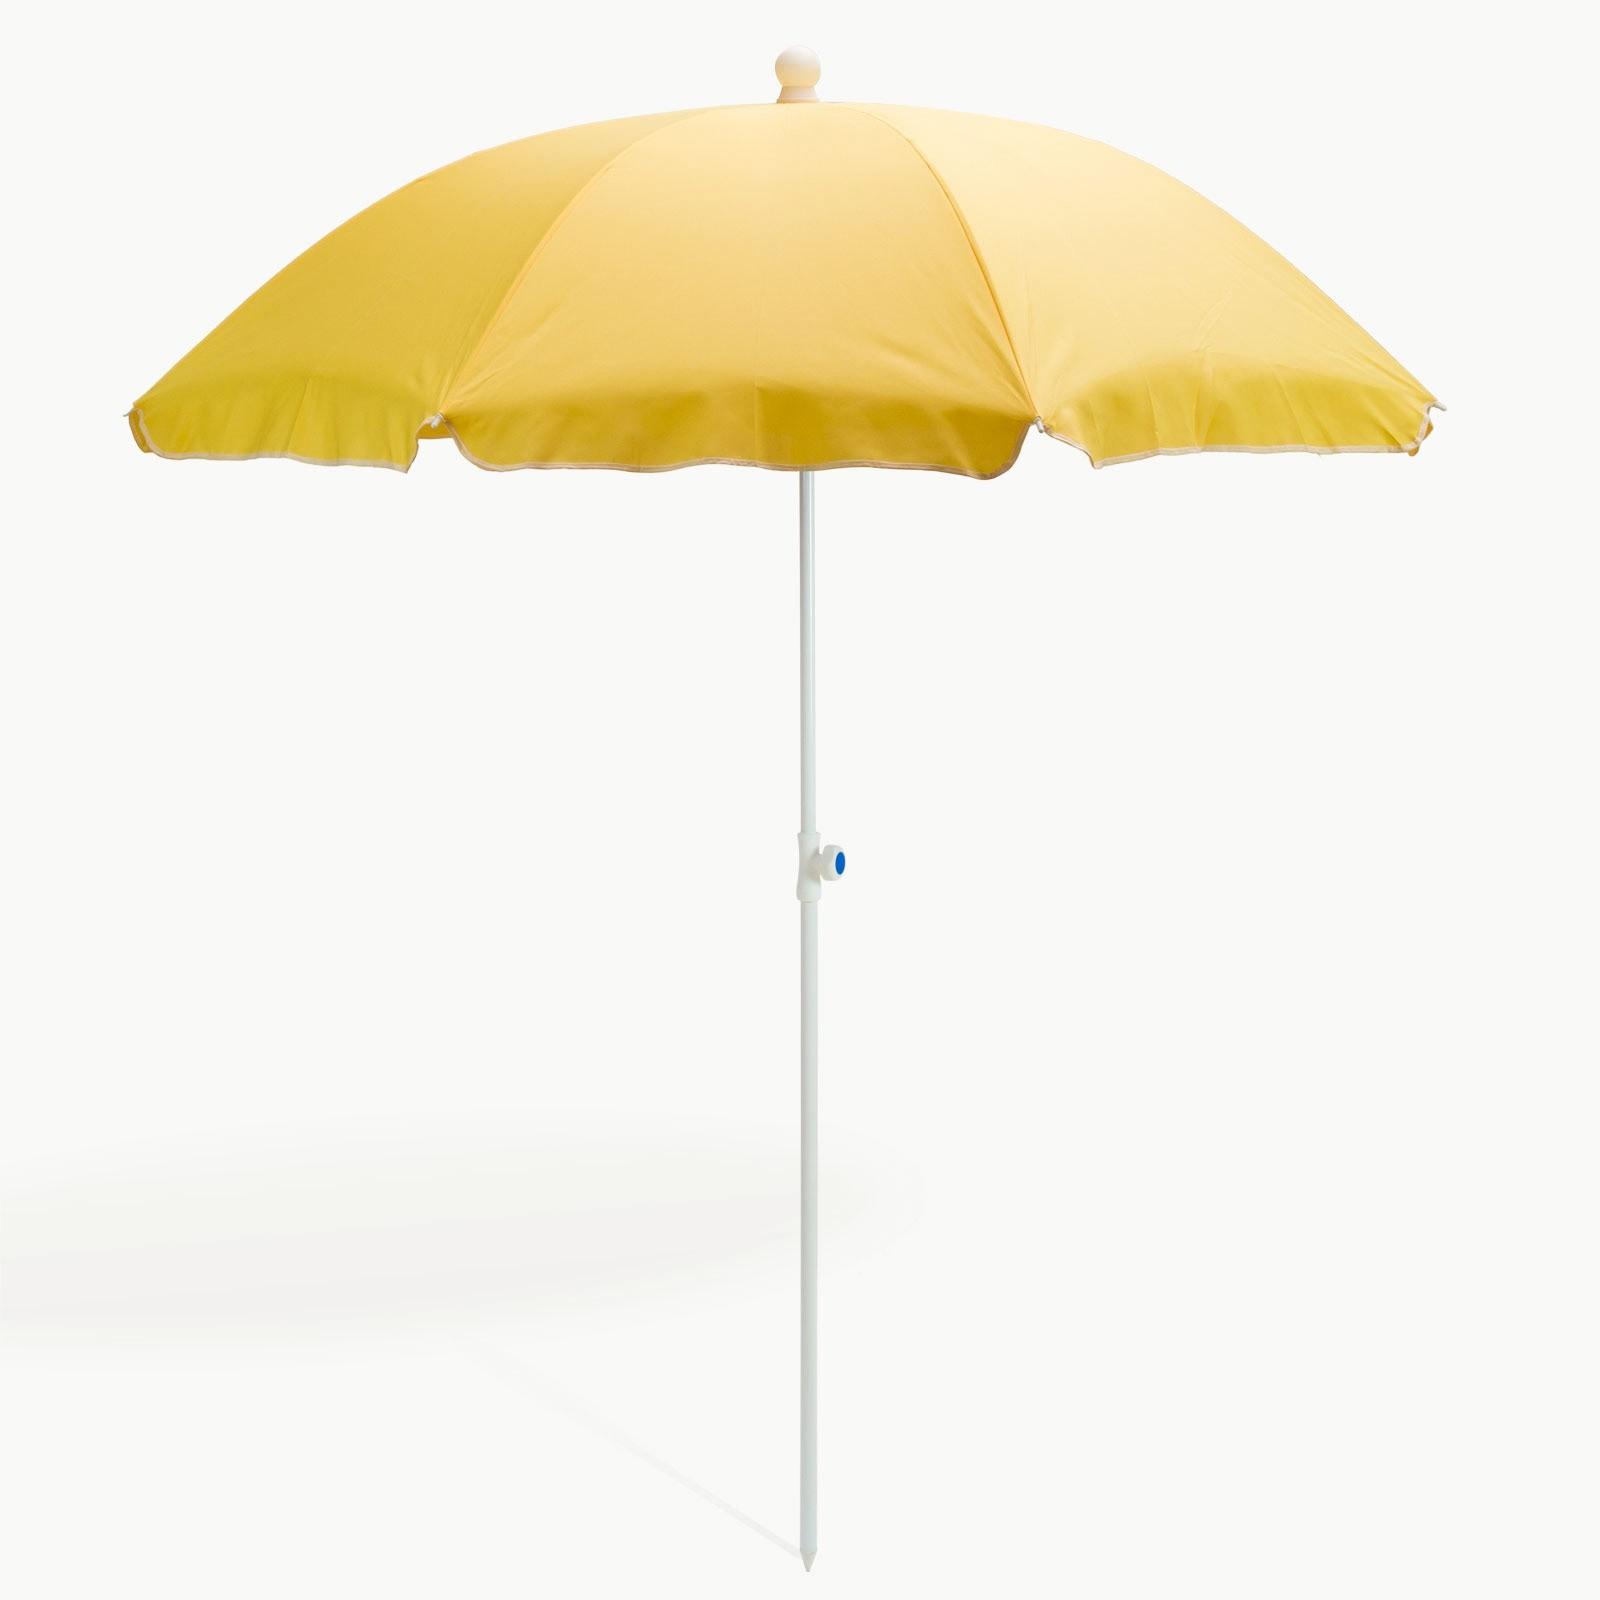 Dema Strandschirm gelb 180 cm UV30 Sonnenschirm Gartenschirm Schirm 41274